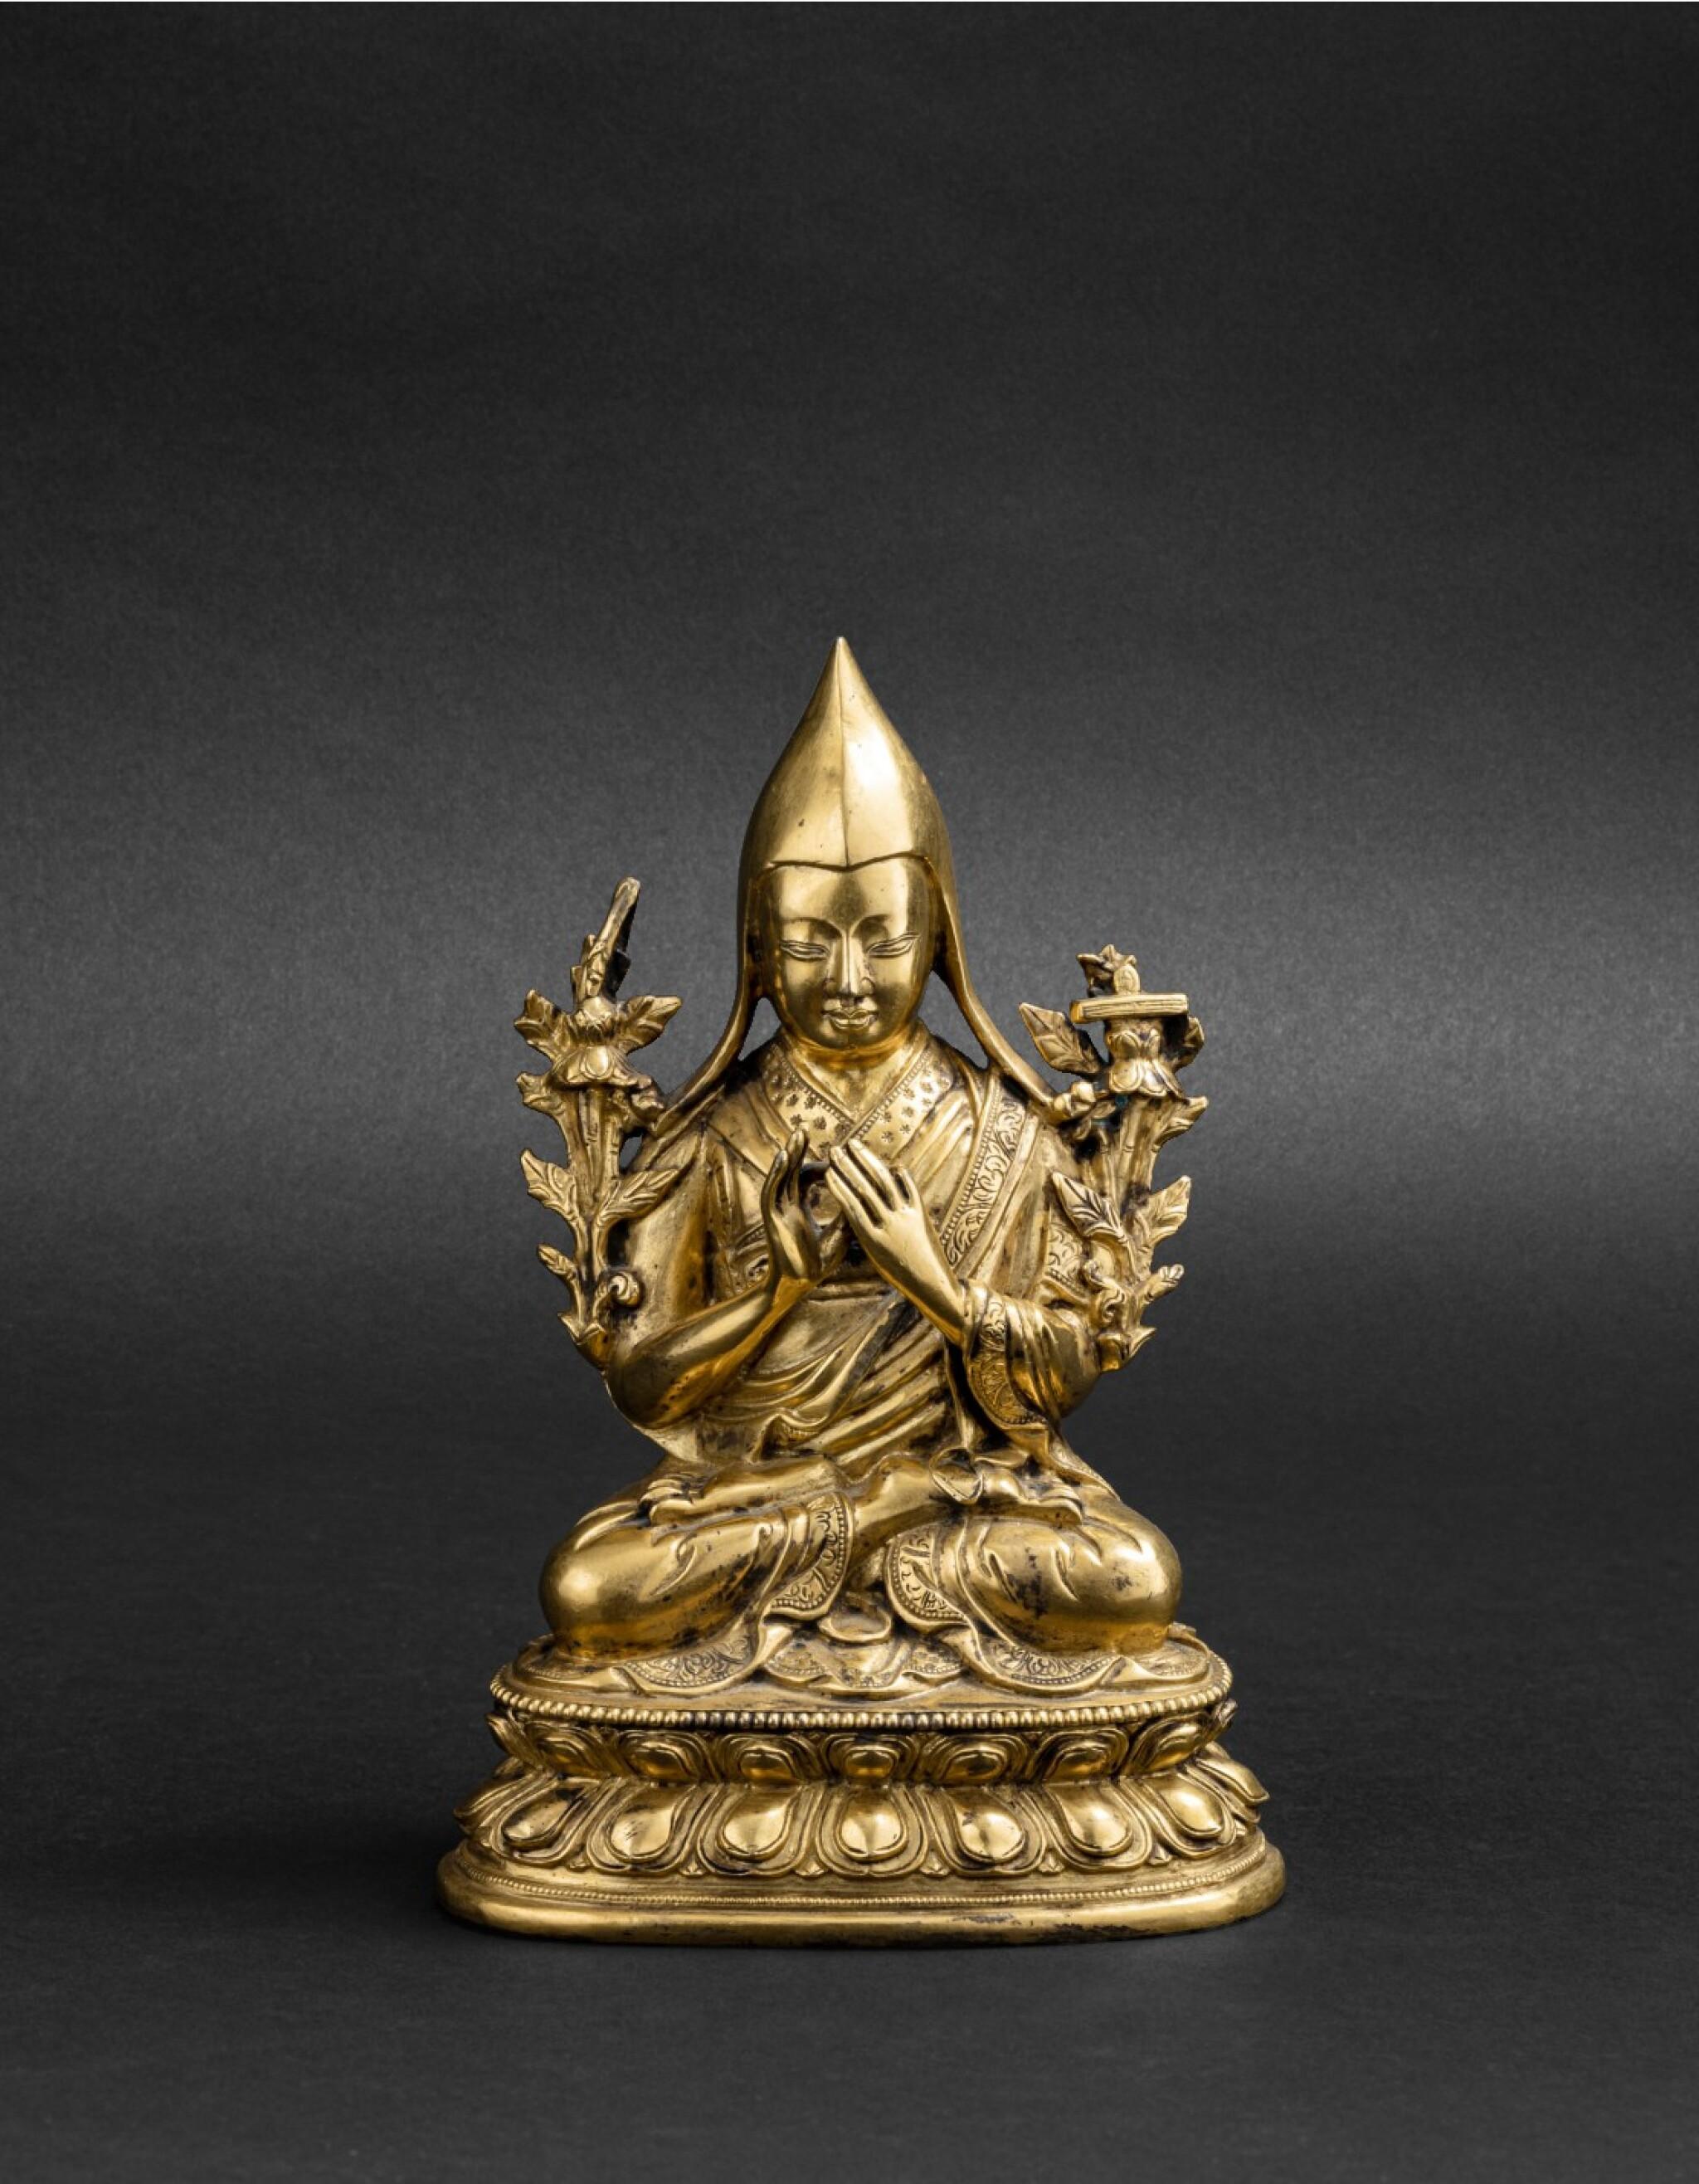 View 1 of Lot 46. Figure de Tsongkapa en bronze doré Dynastie Qing, XVIIIE-XIXE siècle | 清十八至十九世紀 鎏金銅宗喀巴大師坐像 | A gilt-bronze figure of Tsongkapa, Qing Dynasty, 18th-19th century.